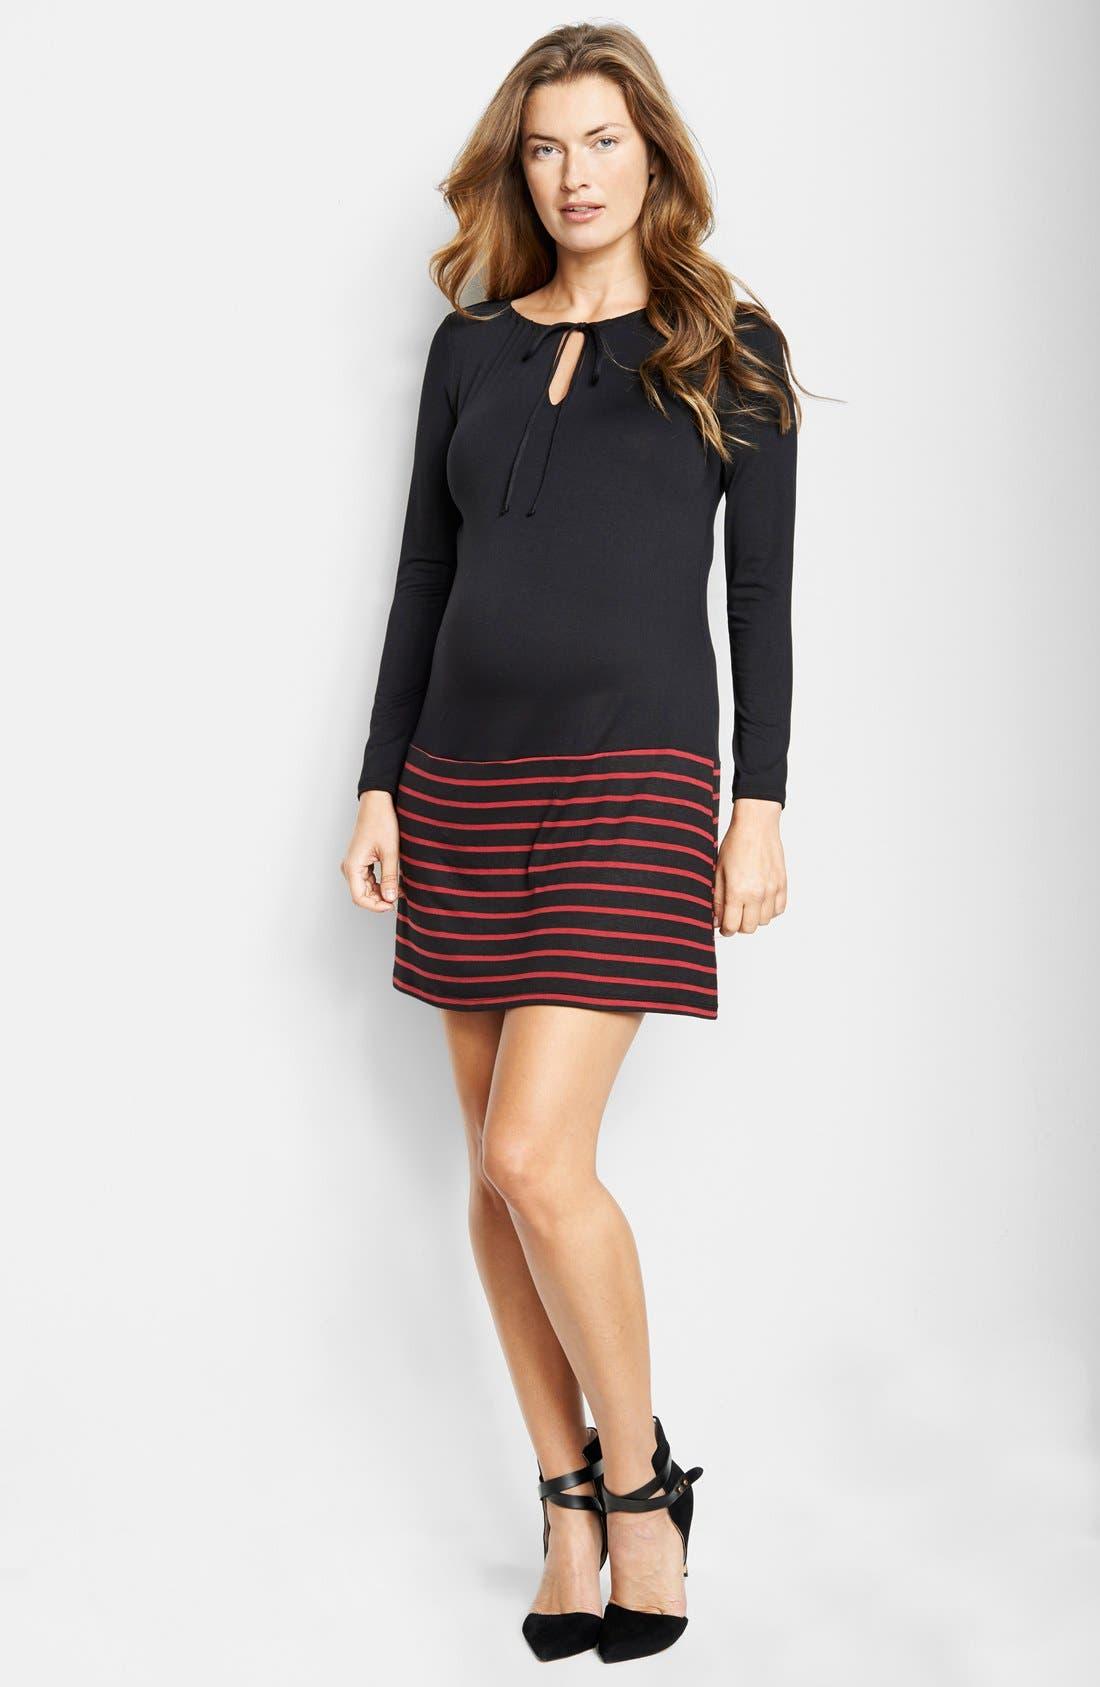 Keyhole Maternity Dress,                         Main,                         color, Black/ Wine Stripes